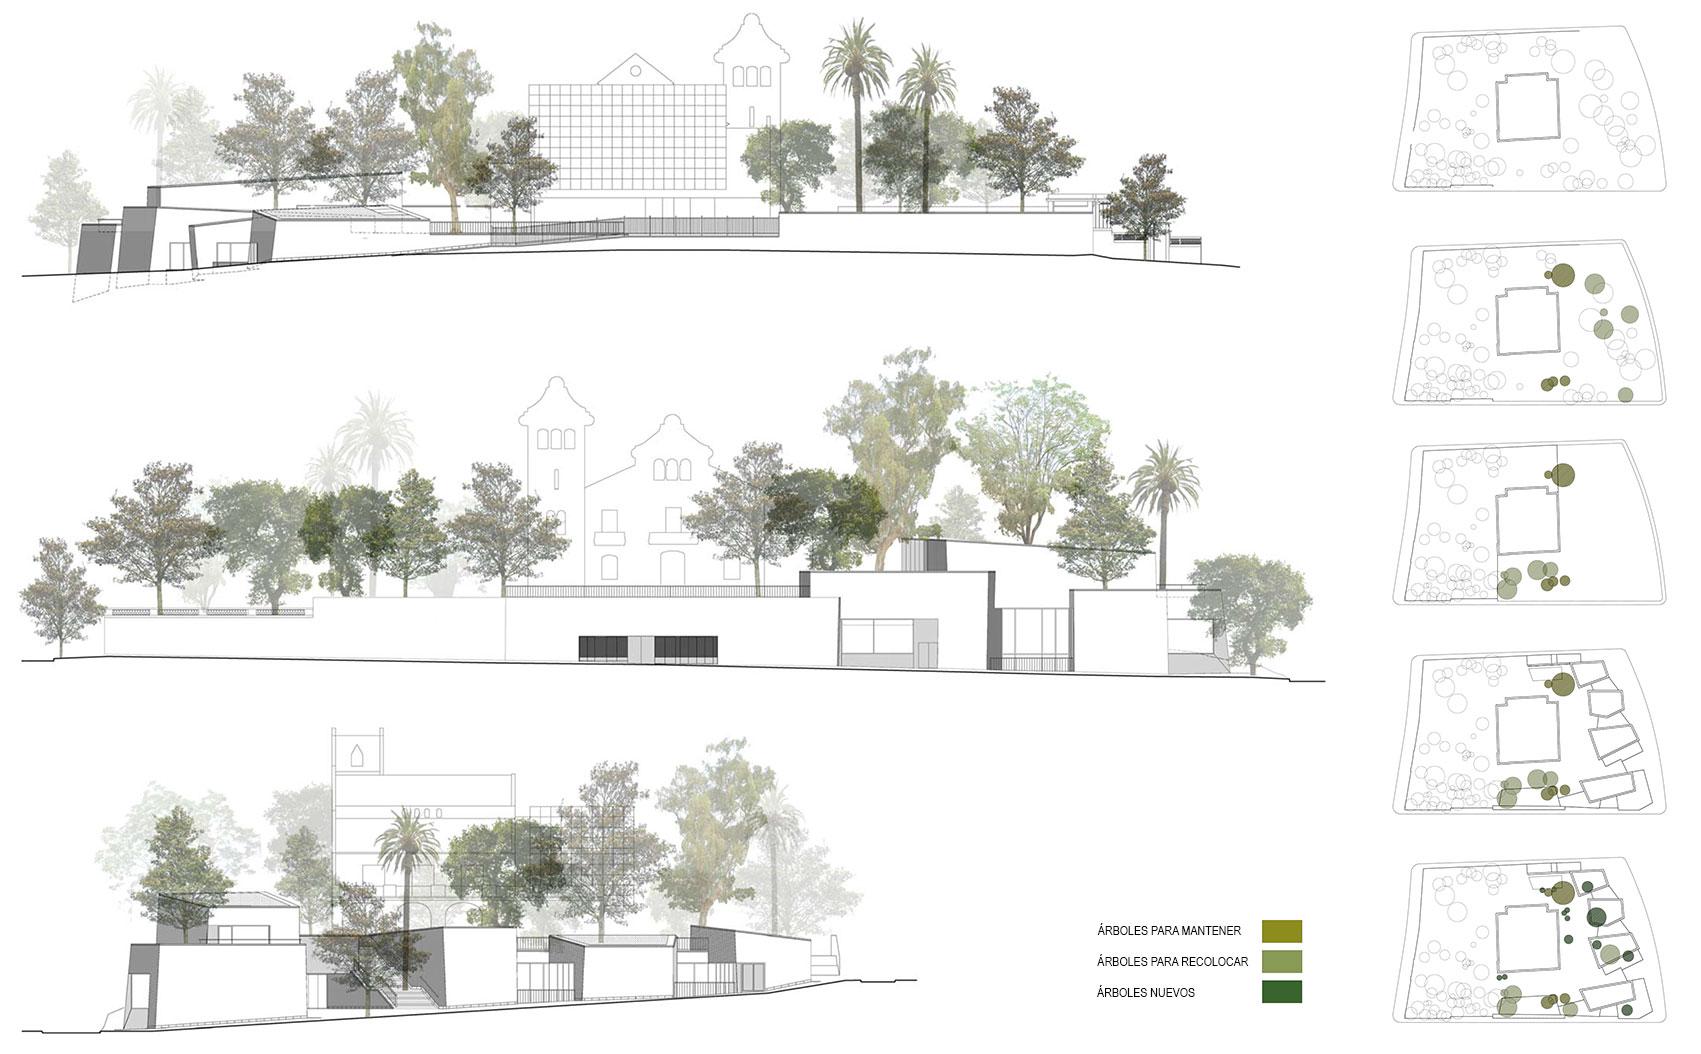 Cubierta jard n garden roof bcq arquitectura barcelona - Alzado arquitectura ...